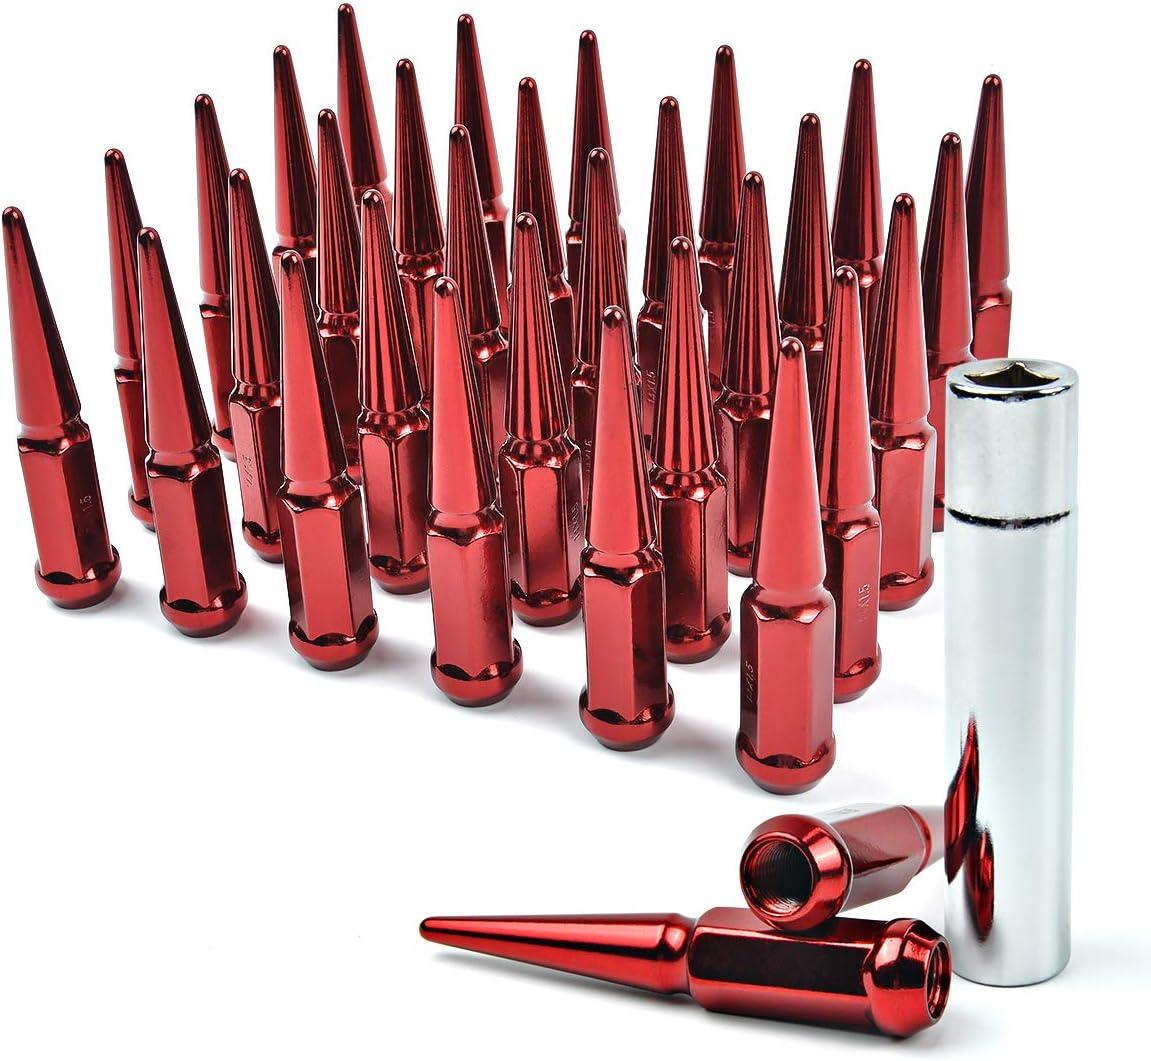 F-150 F-250 F-350 MIKKUPPA M14x1.5 Wheel Spike Lug Nuts 32 PCS Red Spiked Lug Nuts 14mmx1.5 Solid 4.4 Tall Acorn Lug Nut with 1 Socket Key Replacement for Silverado 1500 2500 3500